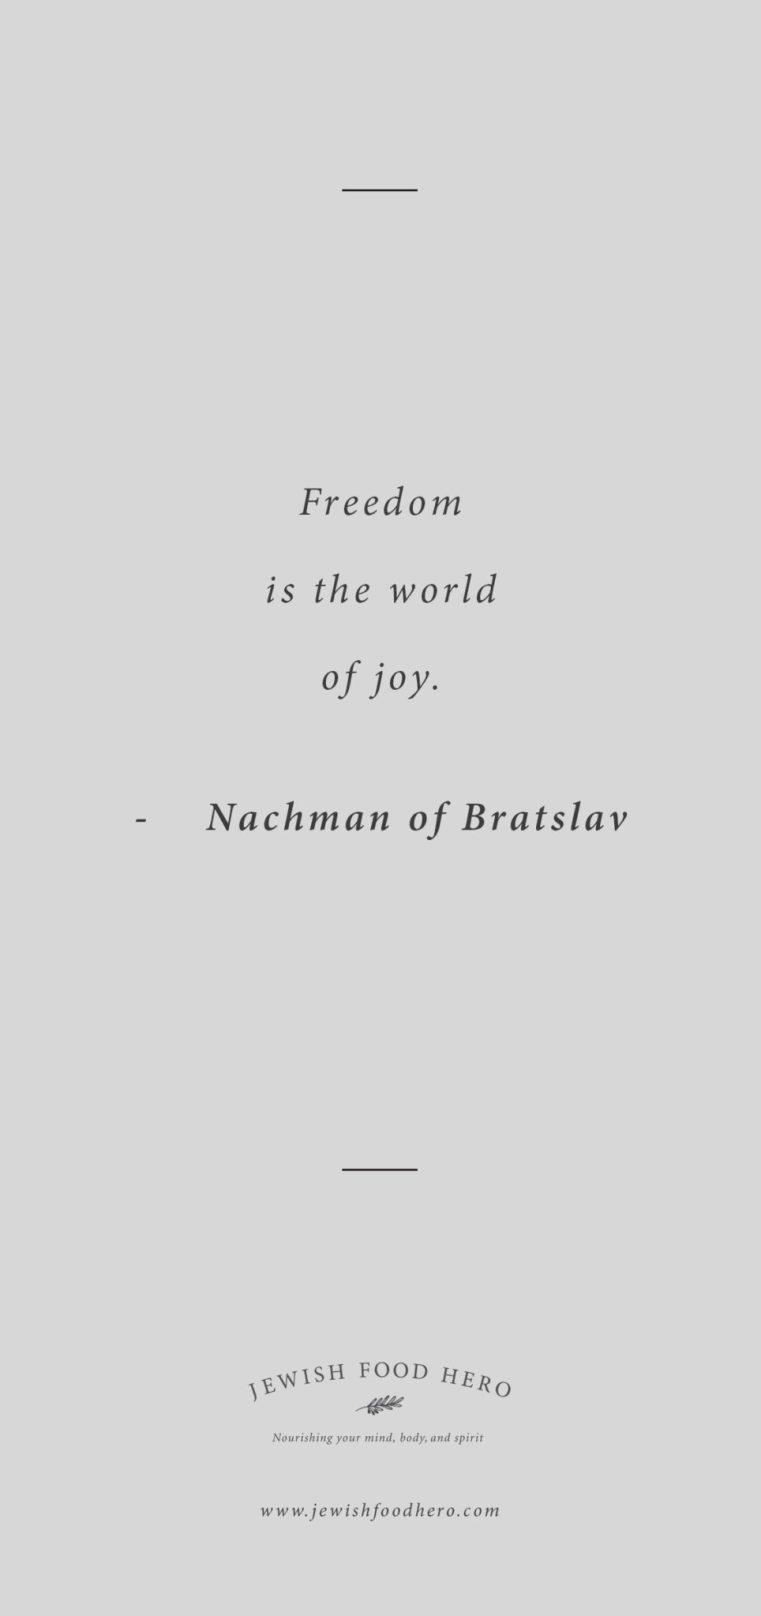 Jewish Quotes on Freedom, Nachman of Bratslav